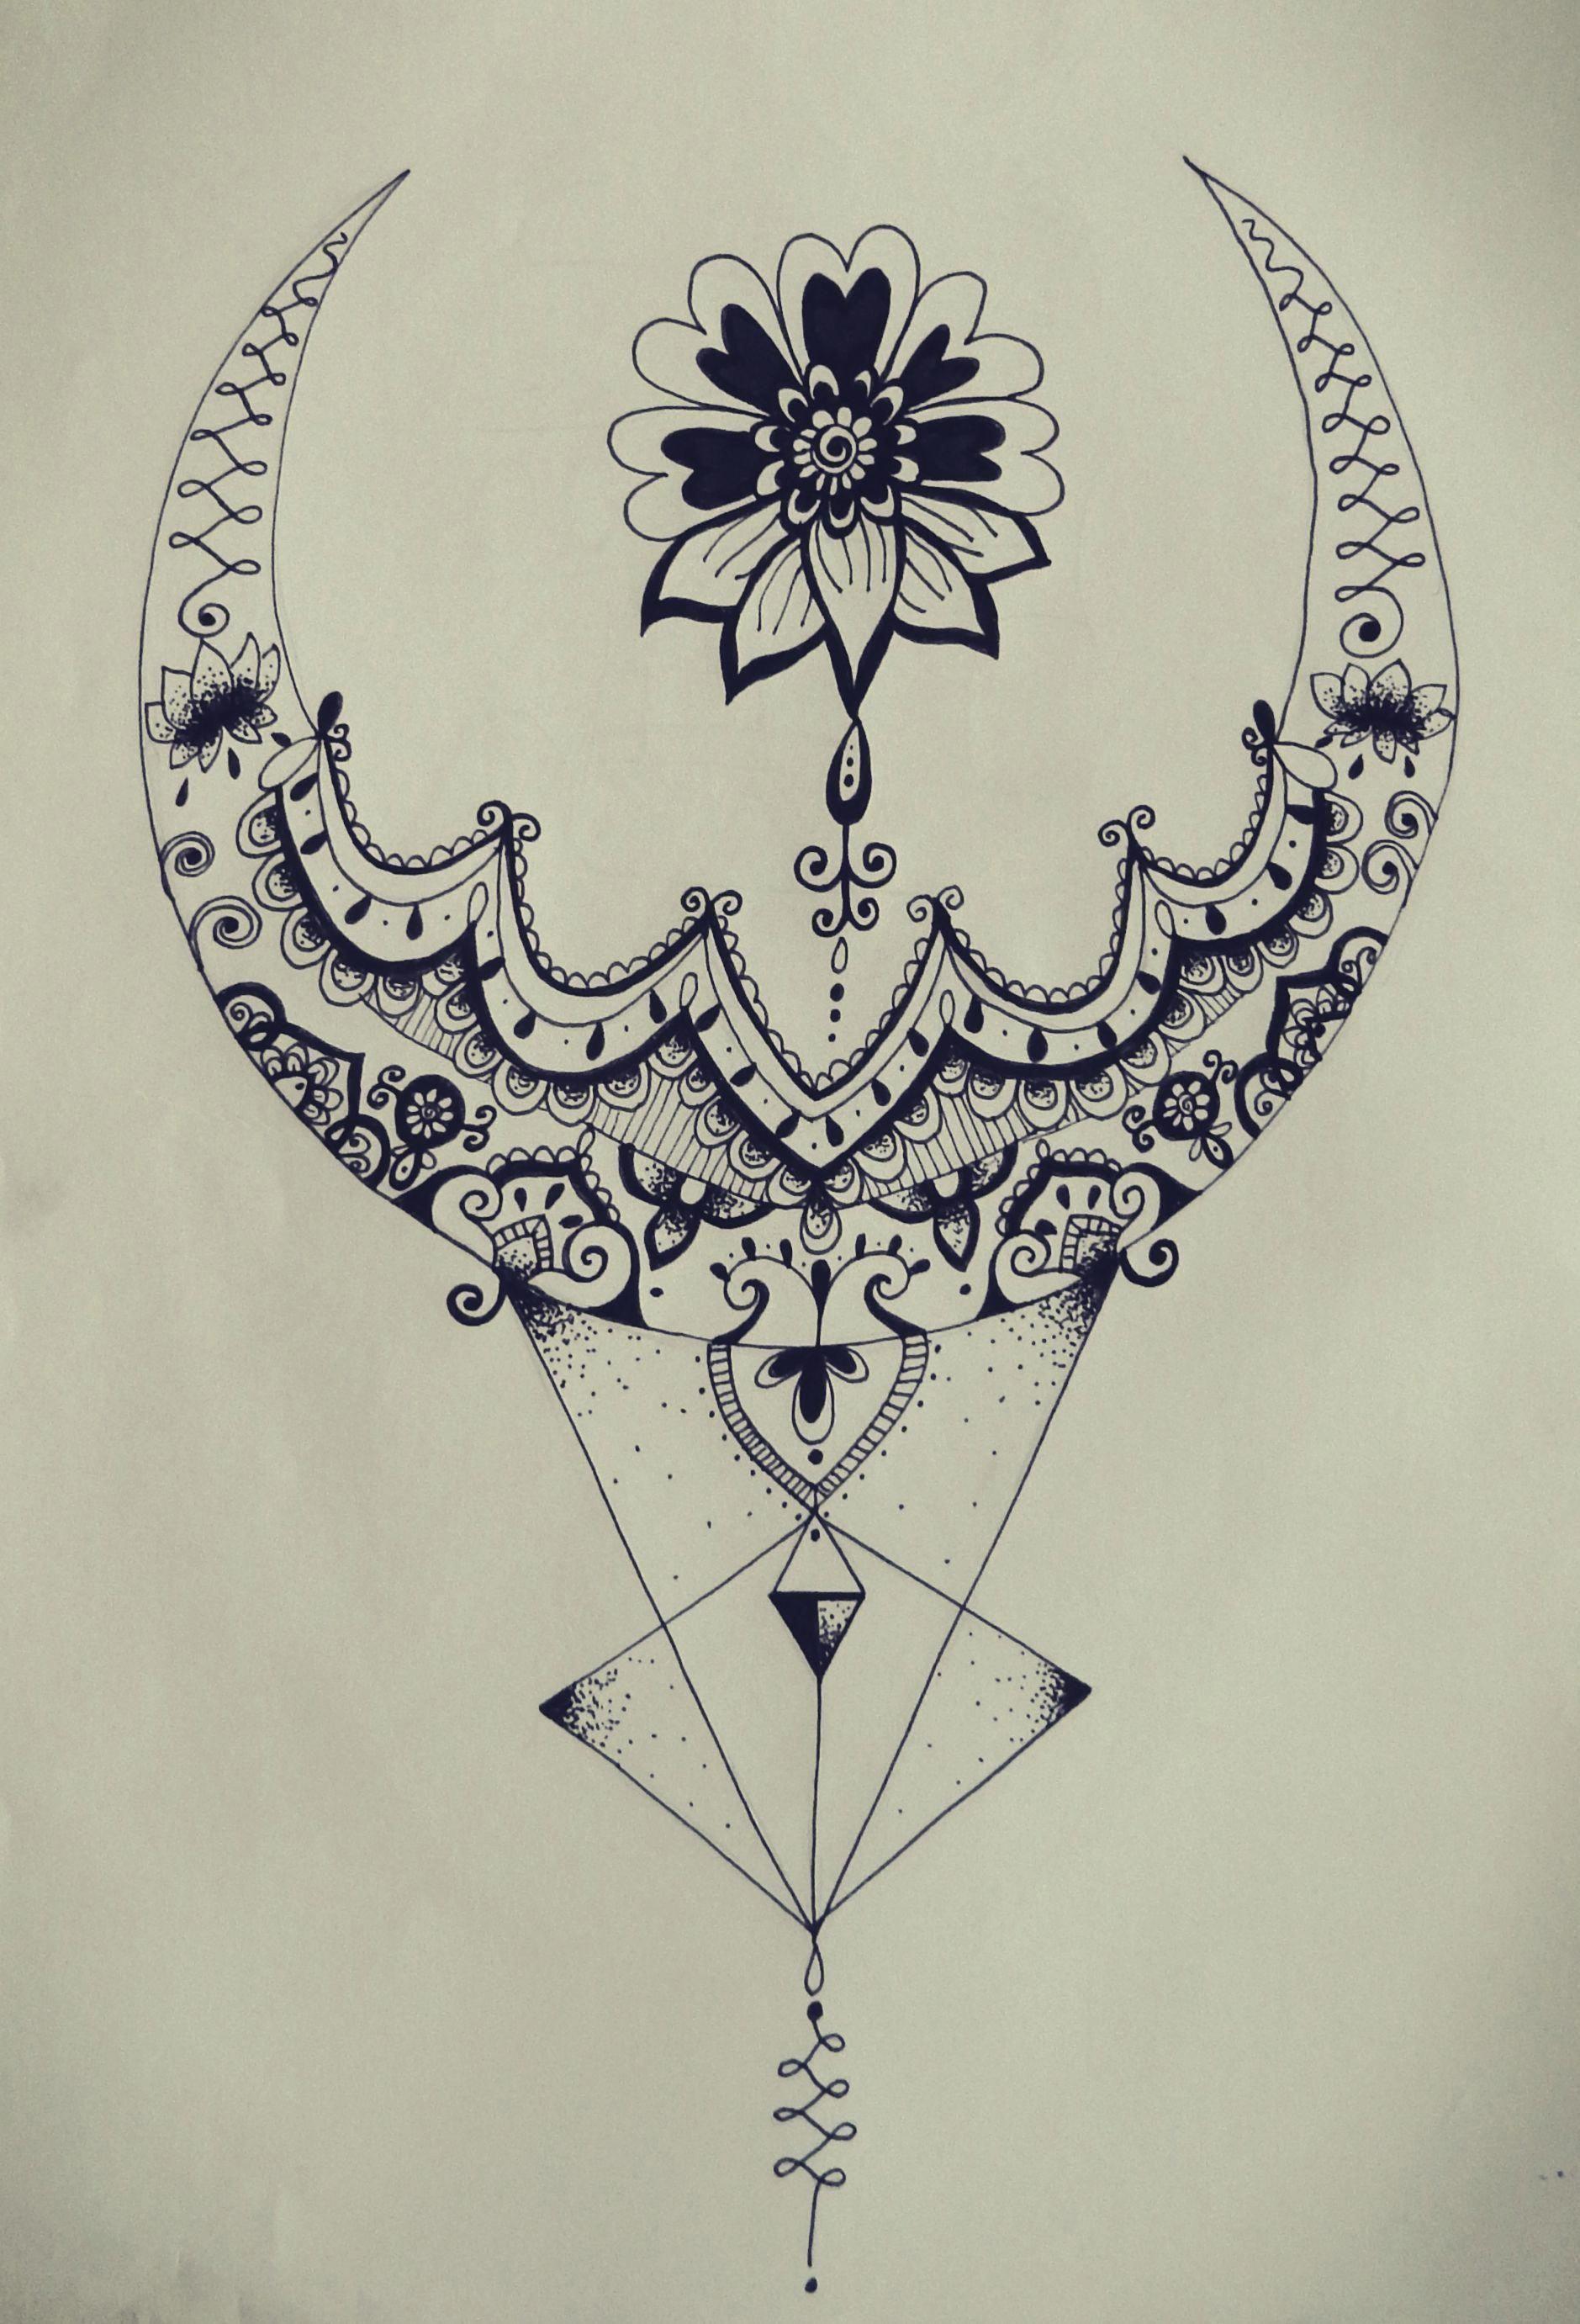 Triangle Zentangle Floral Moon Mandala Tattoo Design Mandalatattoo Populargeometrictattoos Mandala Tattoo Design Moon Tattoo Neck Tattoo